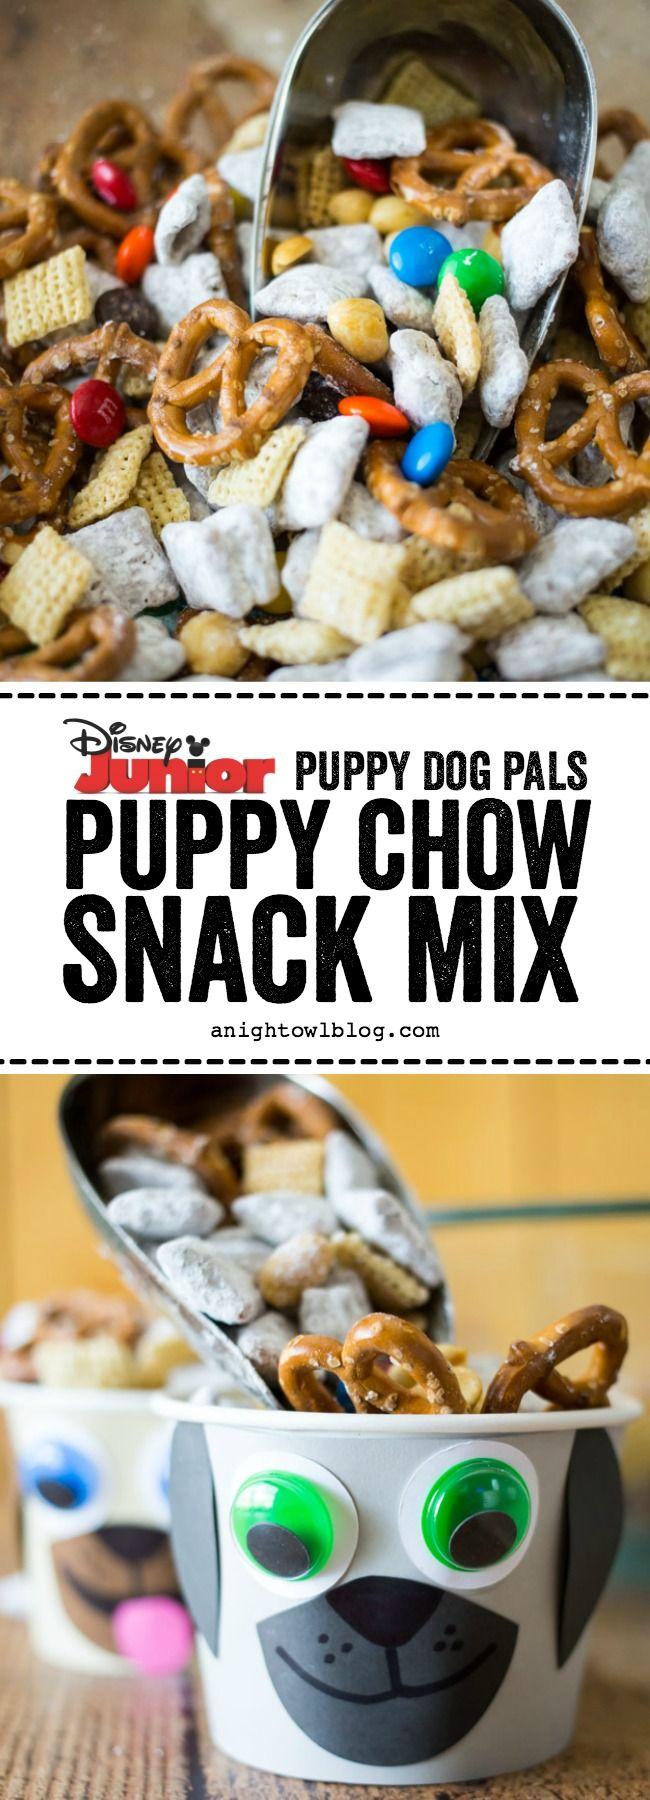 Puppy Dog Pals Puppy Chow Snack Mix Recipe Puppy chow